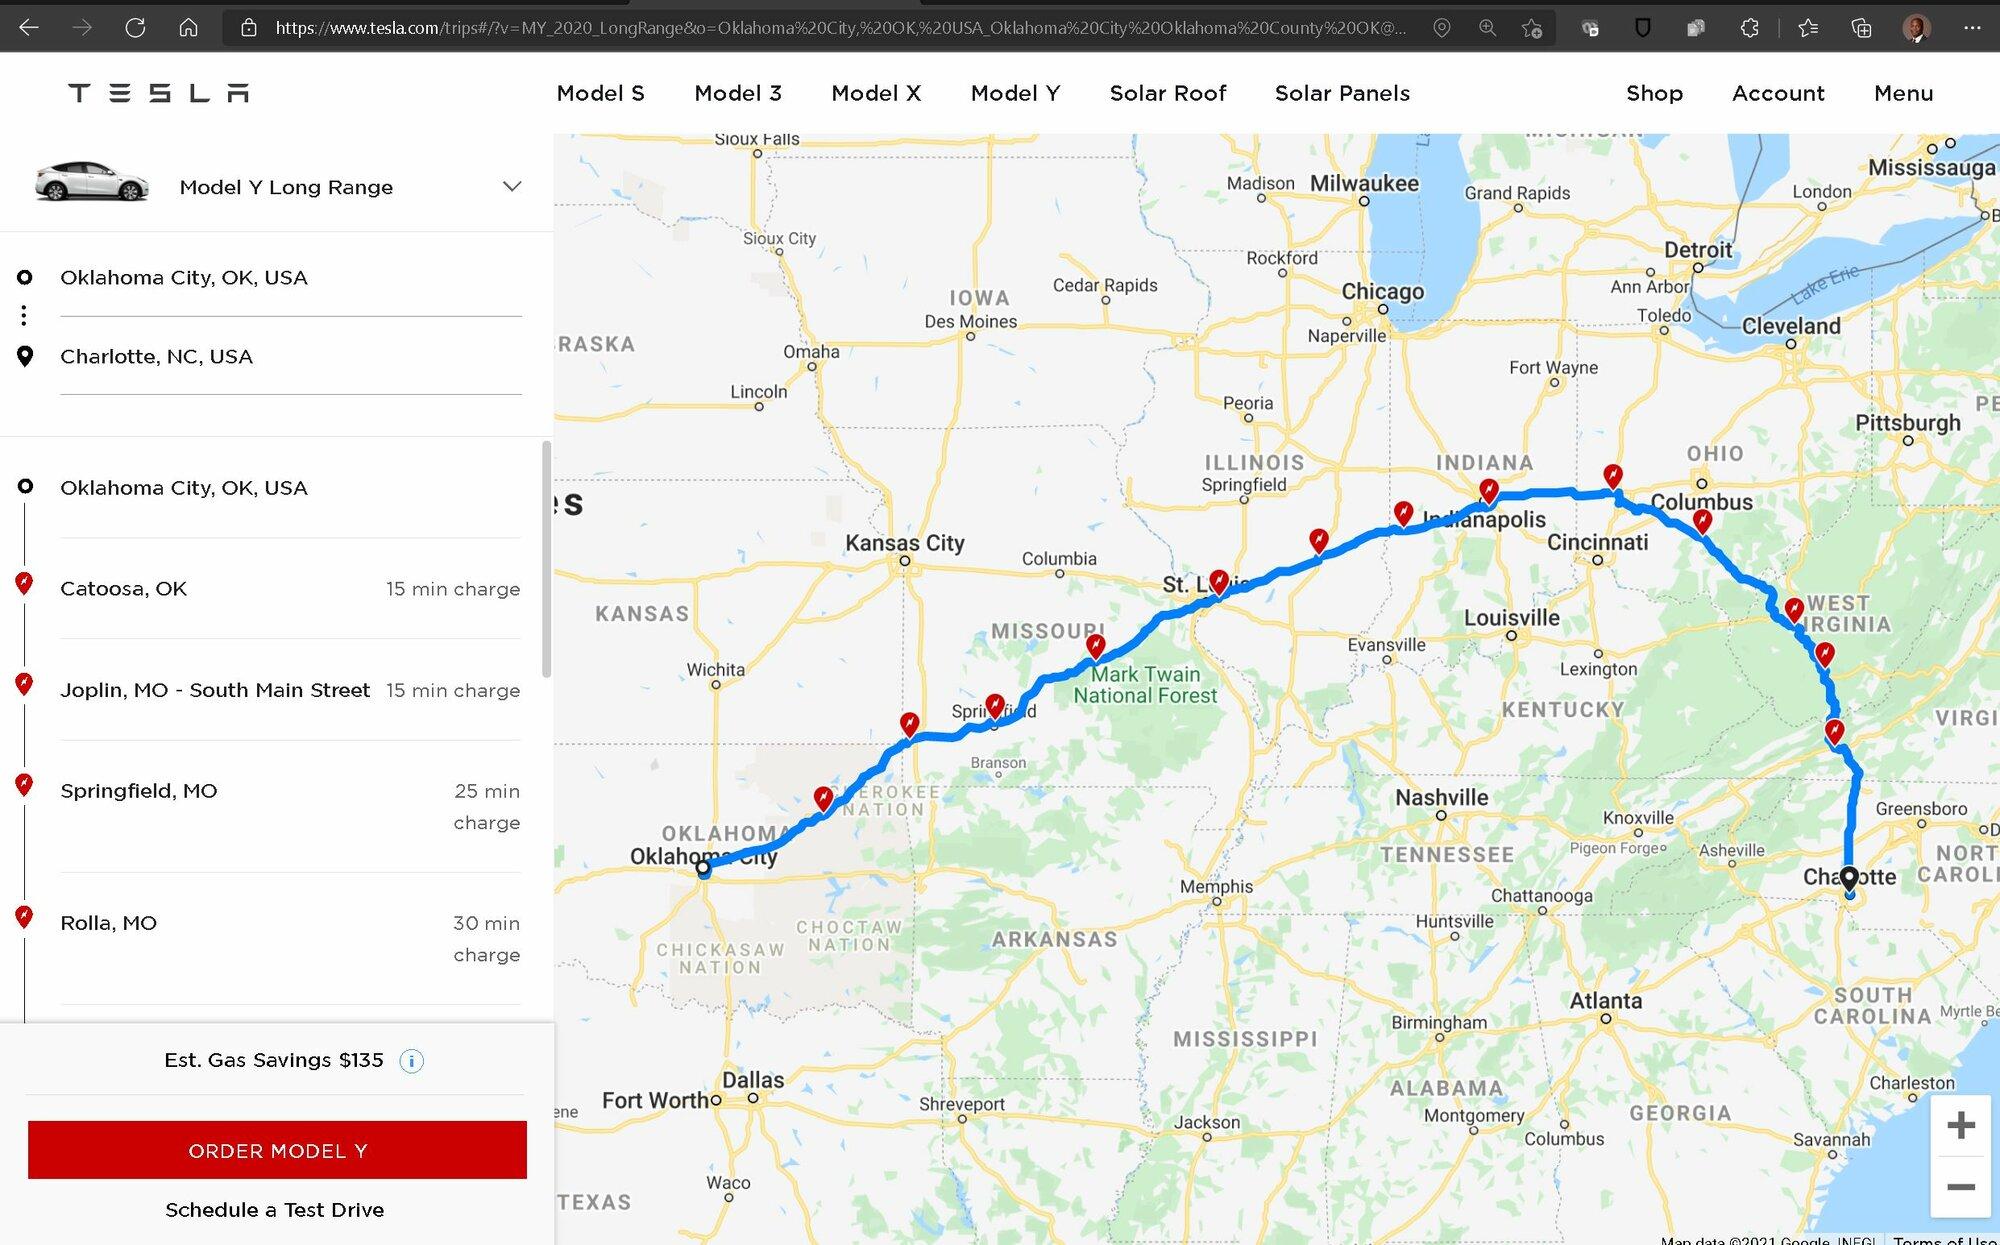 tesla.com-trips wacky results.JPG